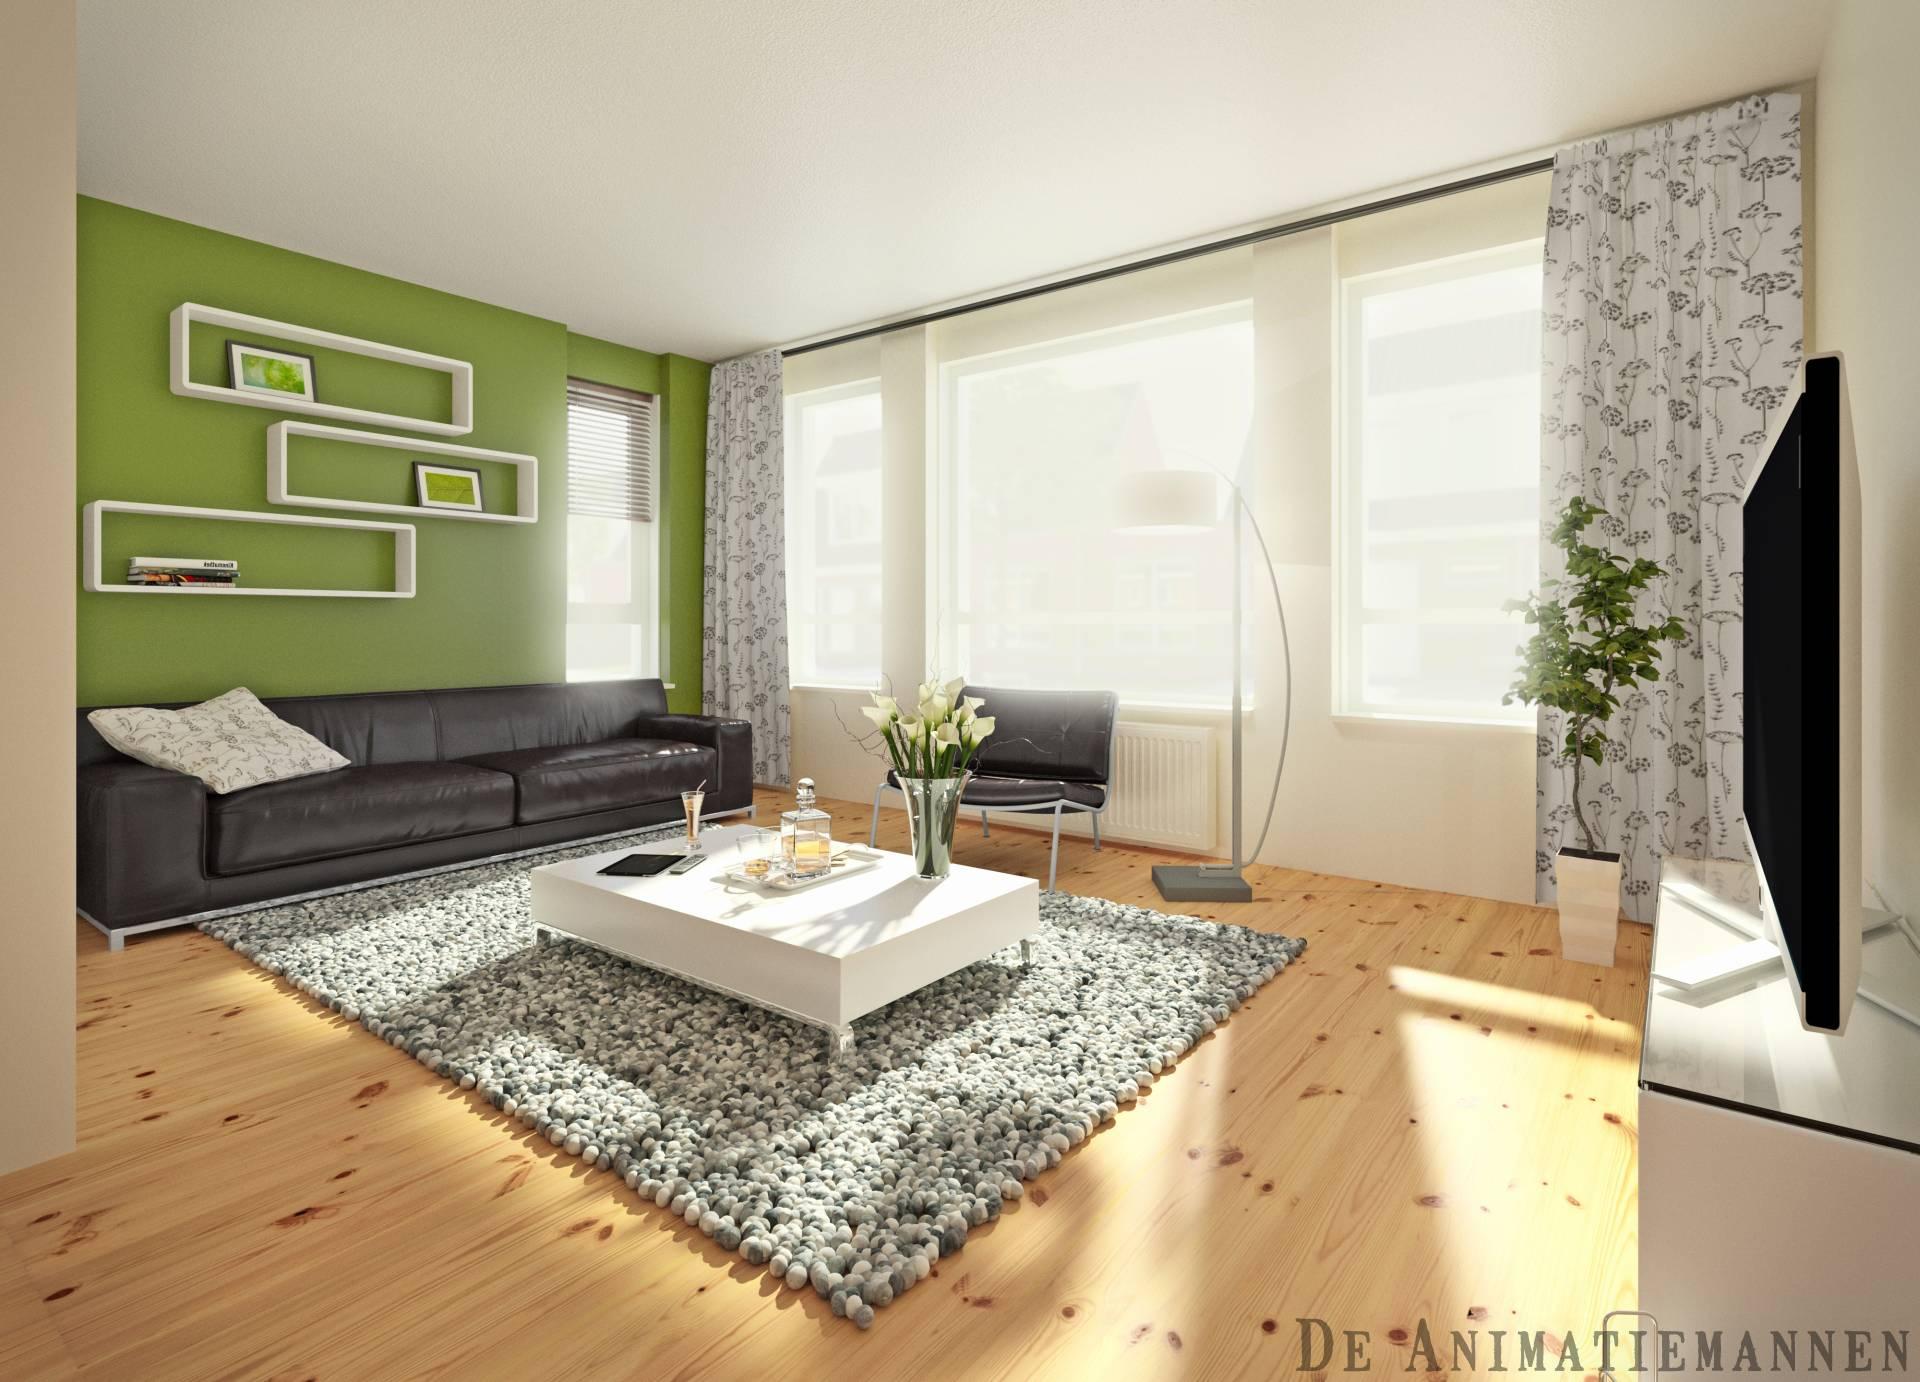 Interieur Impressie 2-1kapper Woonkamer » De Animatiemannen